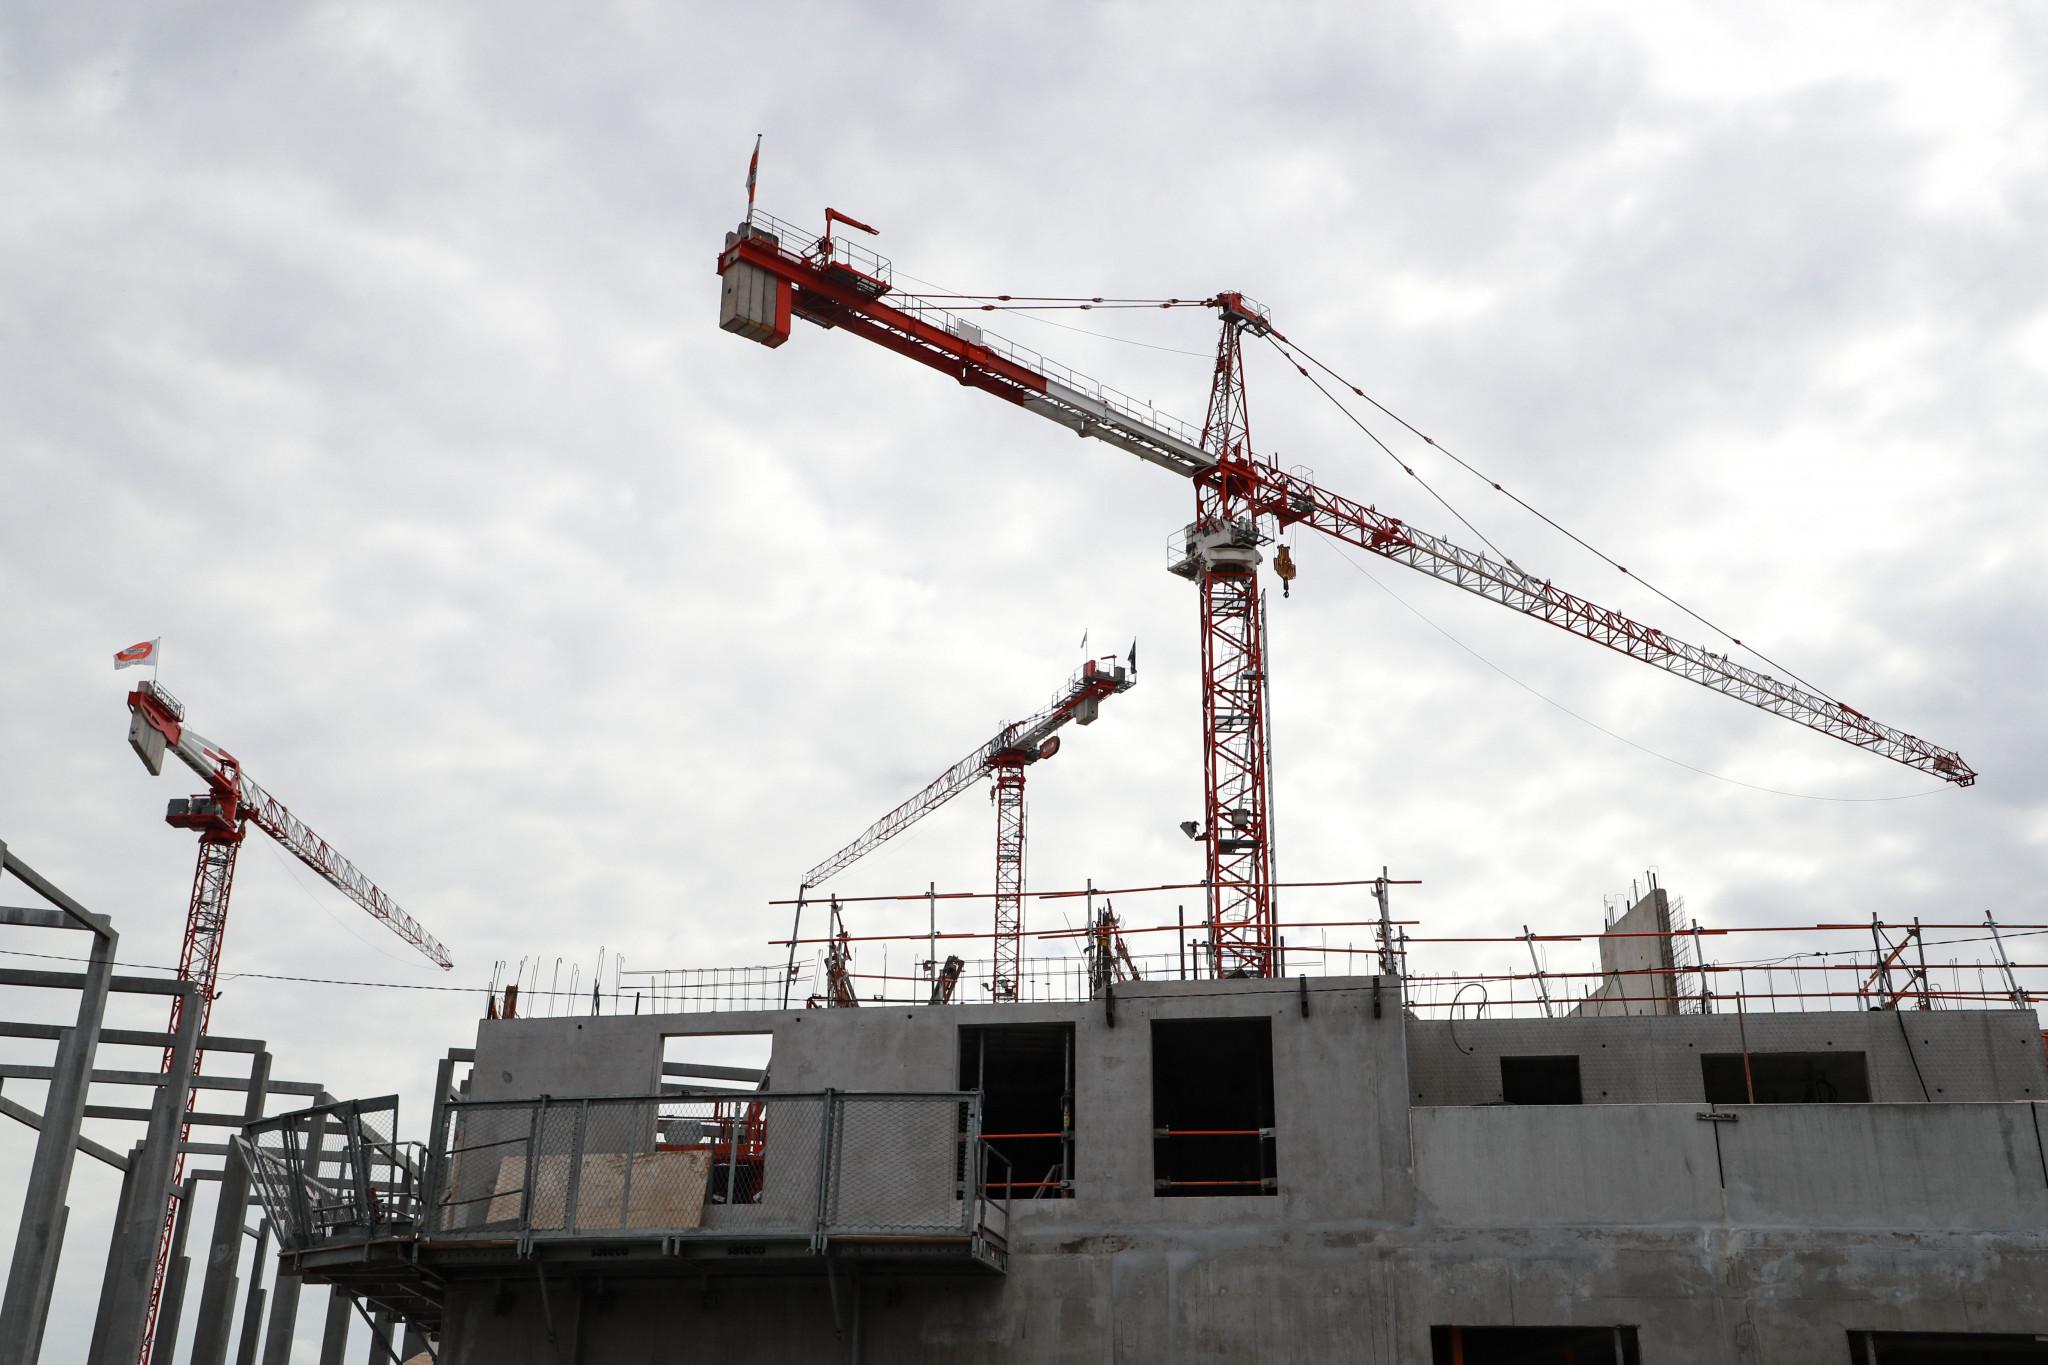 Coronavirus impacting Birmingham 2022 construction projects